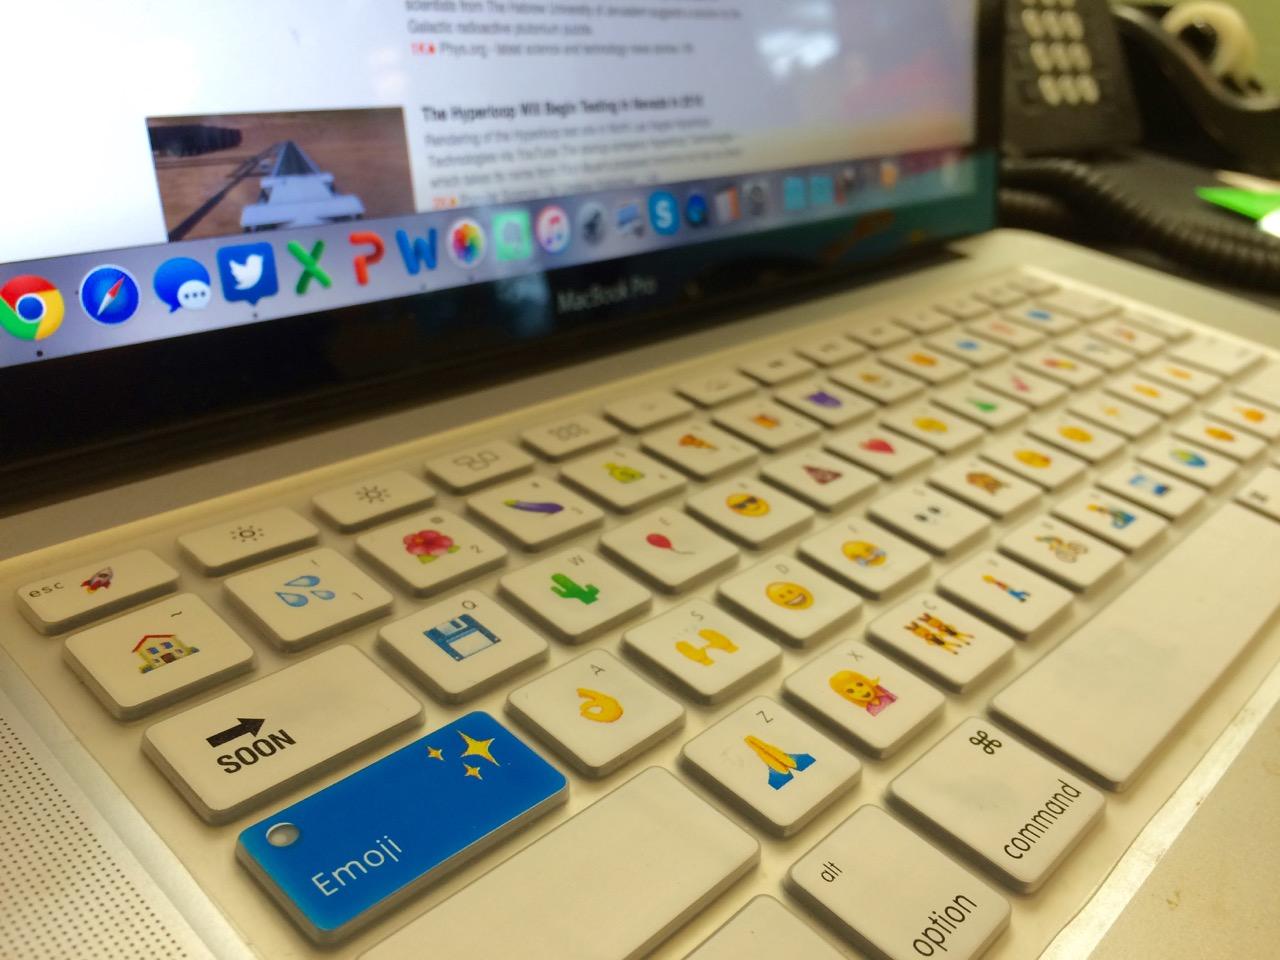 Emoji keyboard! 💾😎😢💩👗